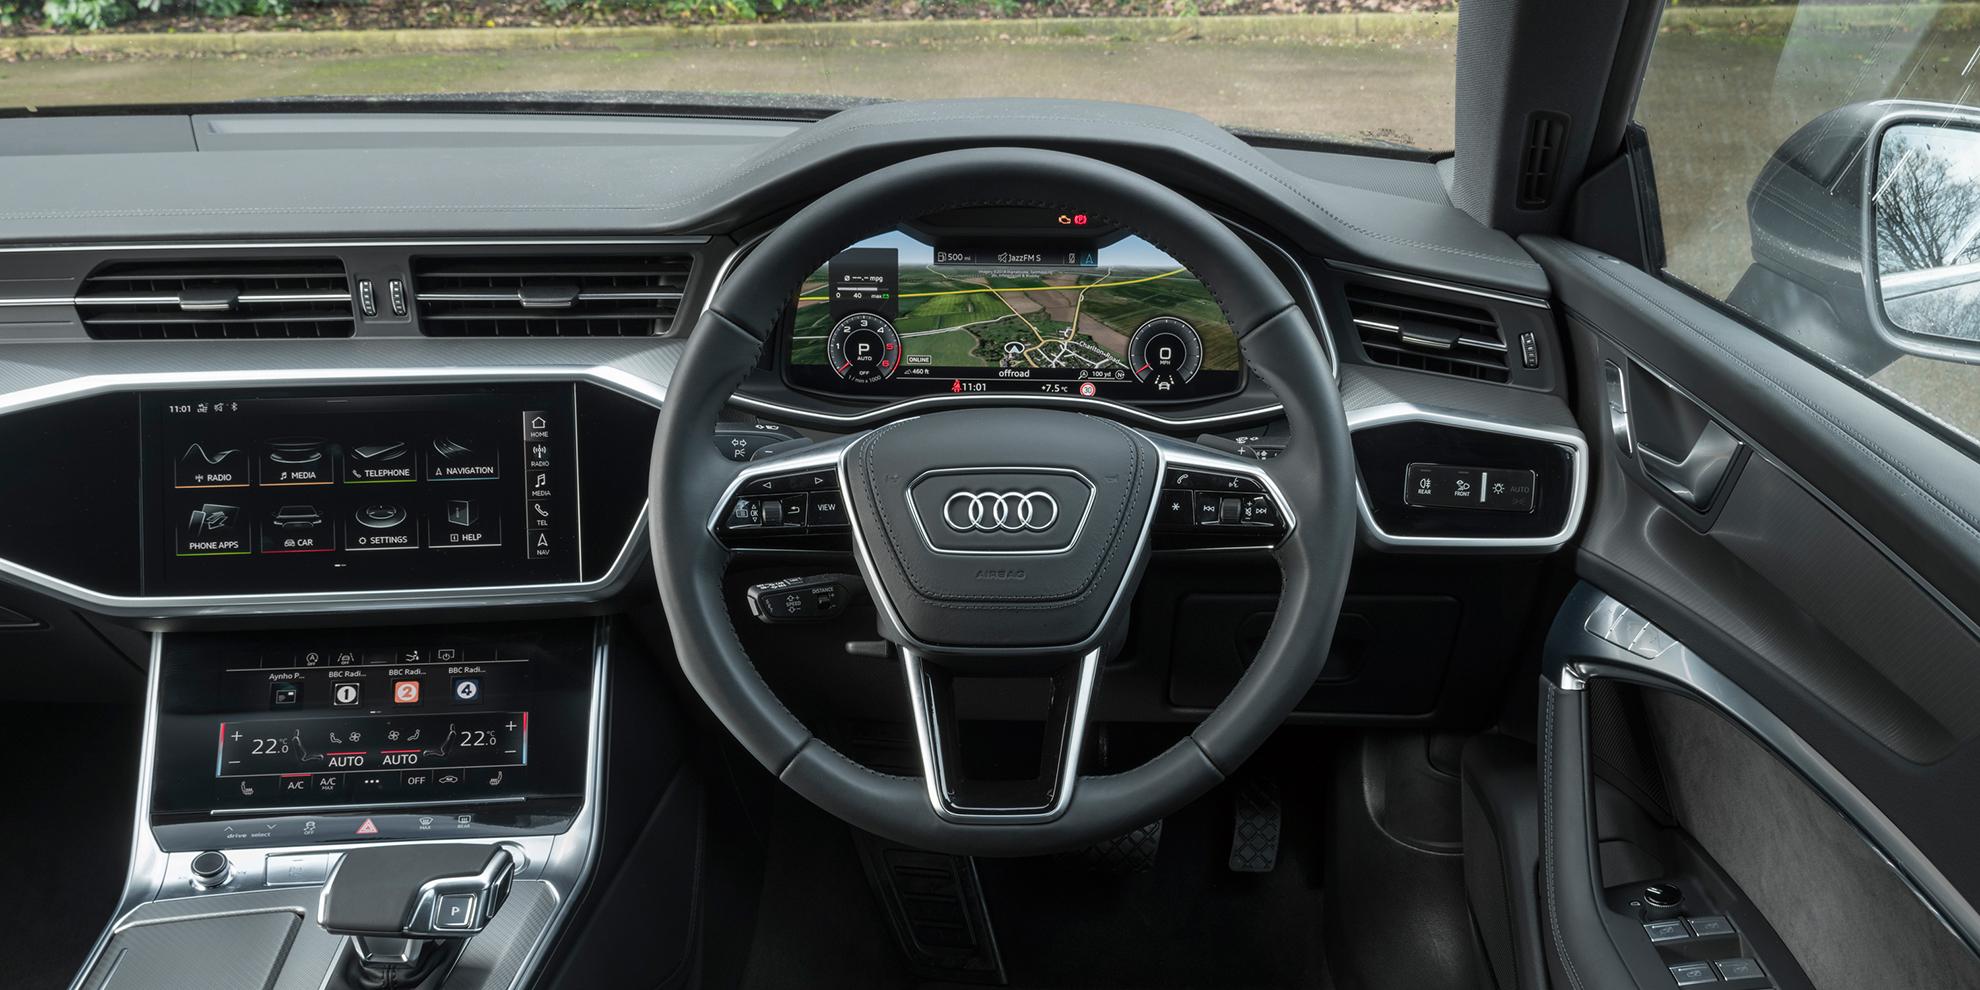 Kelebihan Kekurangan Audi A7 Sportback Murah Berkualitas